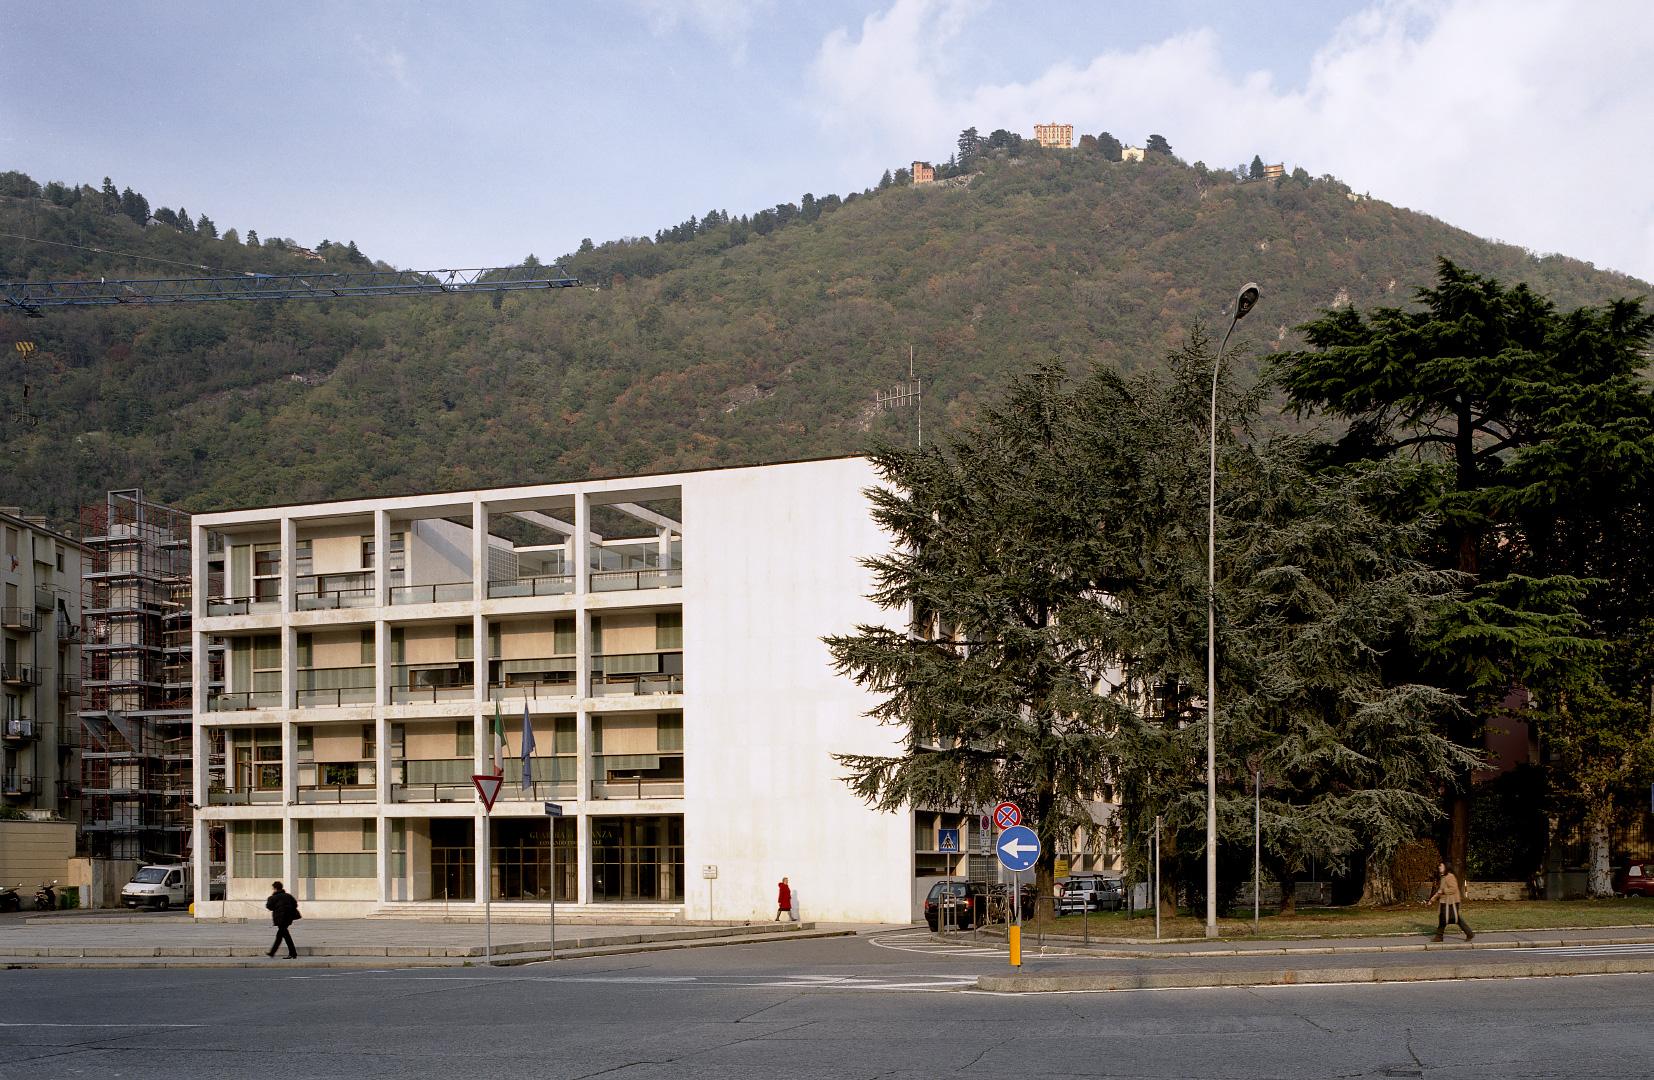 casa-del-fascio-como_22_ULTIMA-DI-Terragni-Como-Casa-del-Fascio